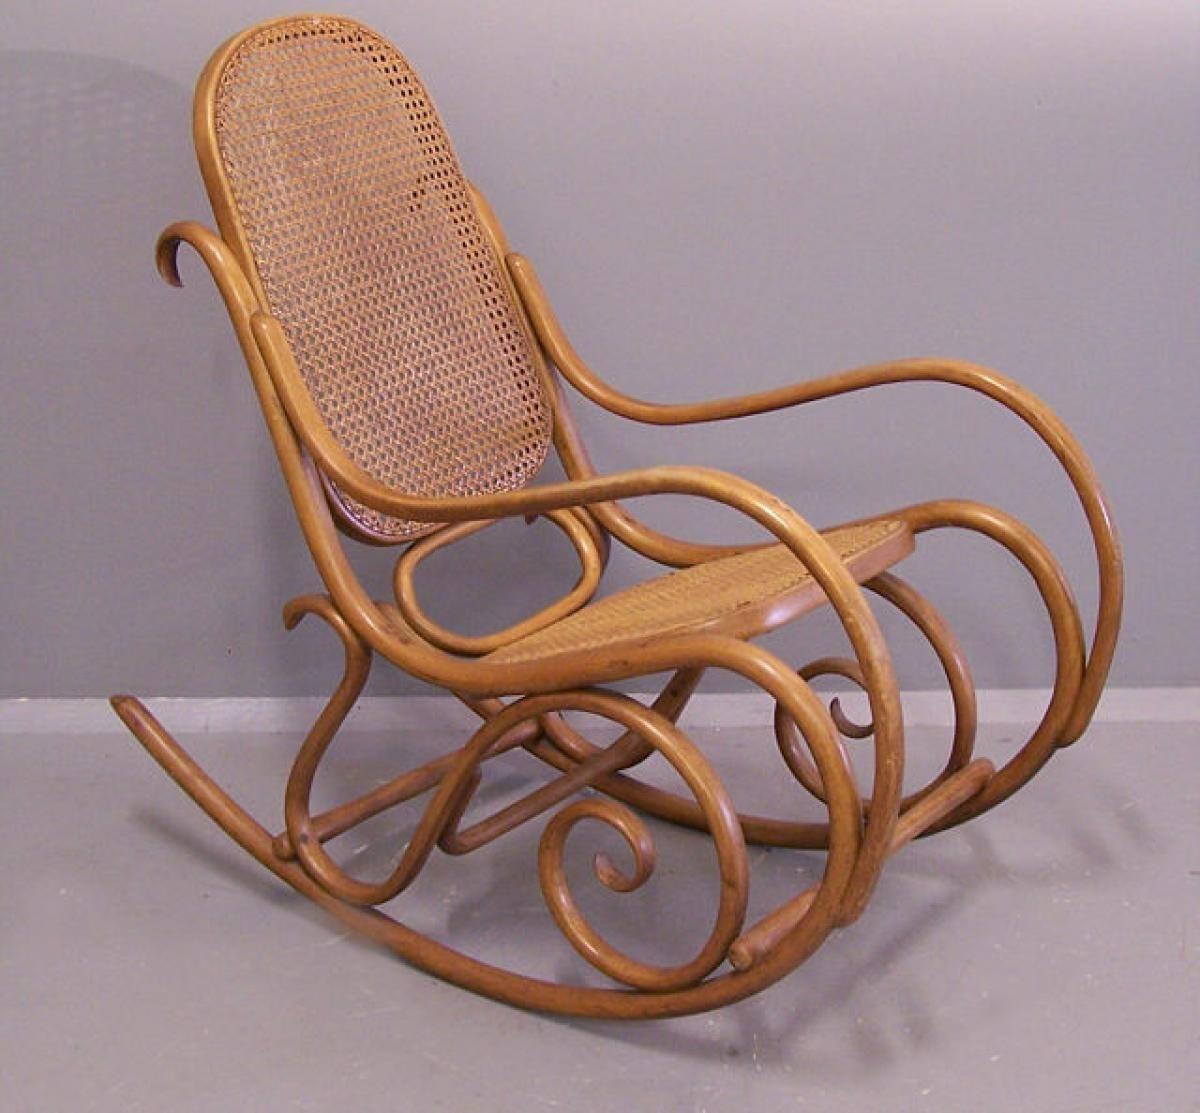 gebruder thonet bentwood rocking chair number 7025 thonet